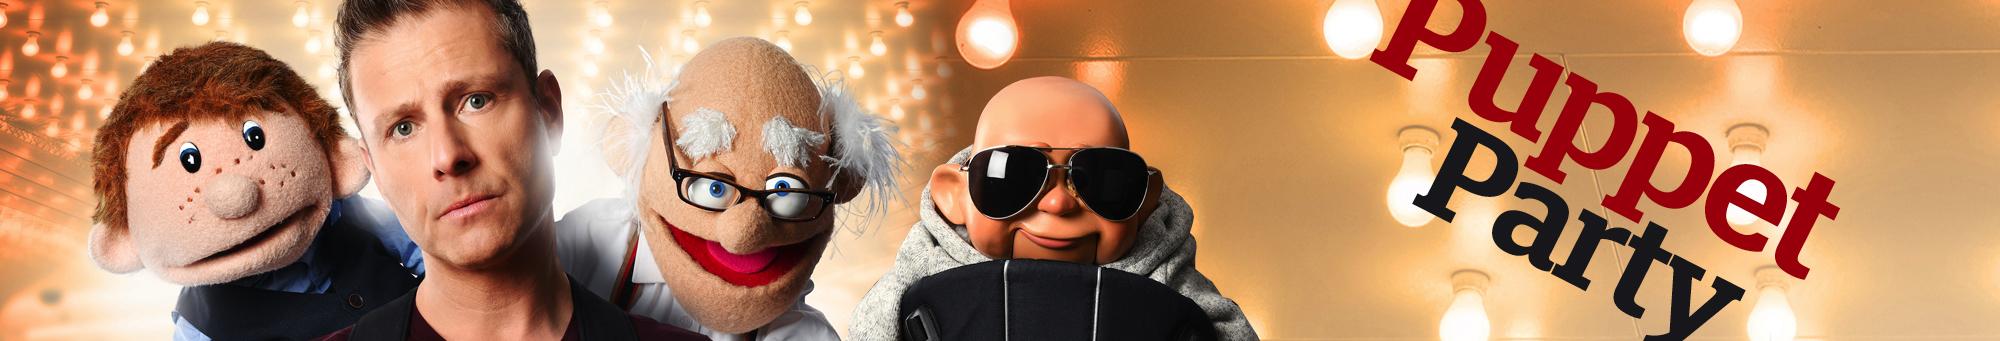 Paul Zerdin Puppet Party